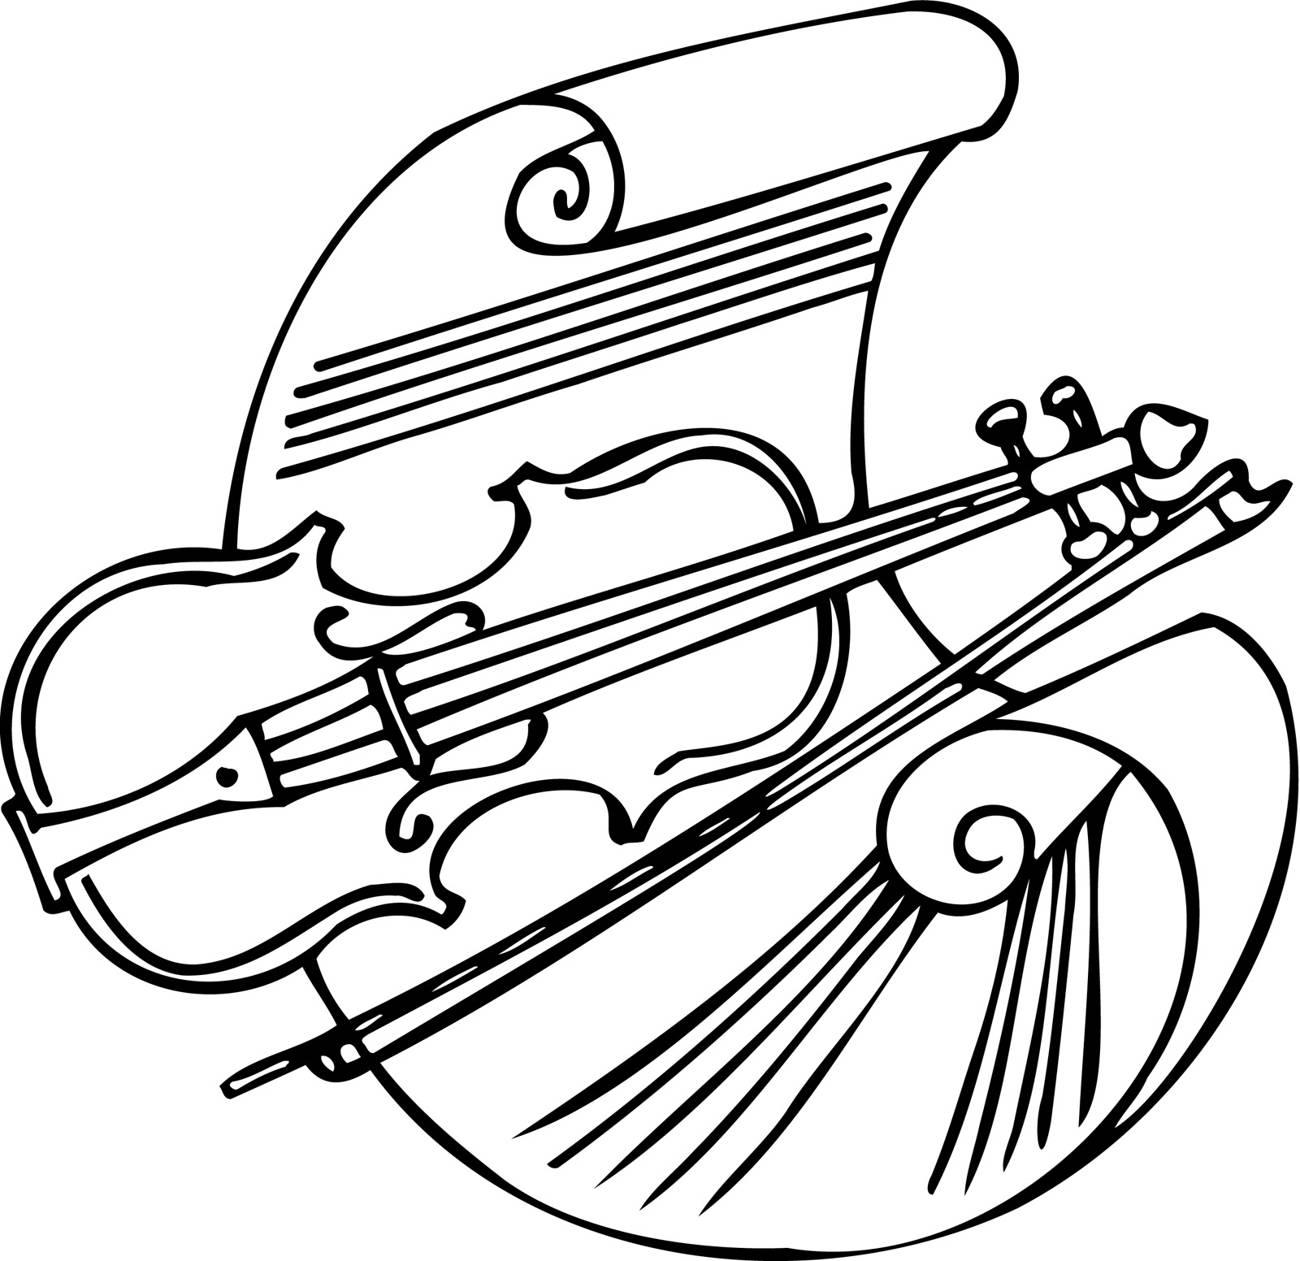 MUSIC-060